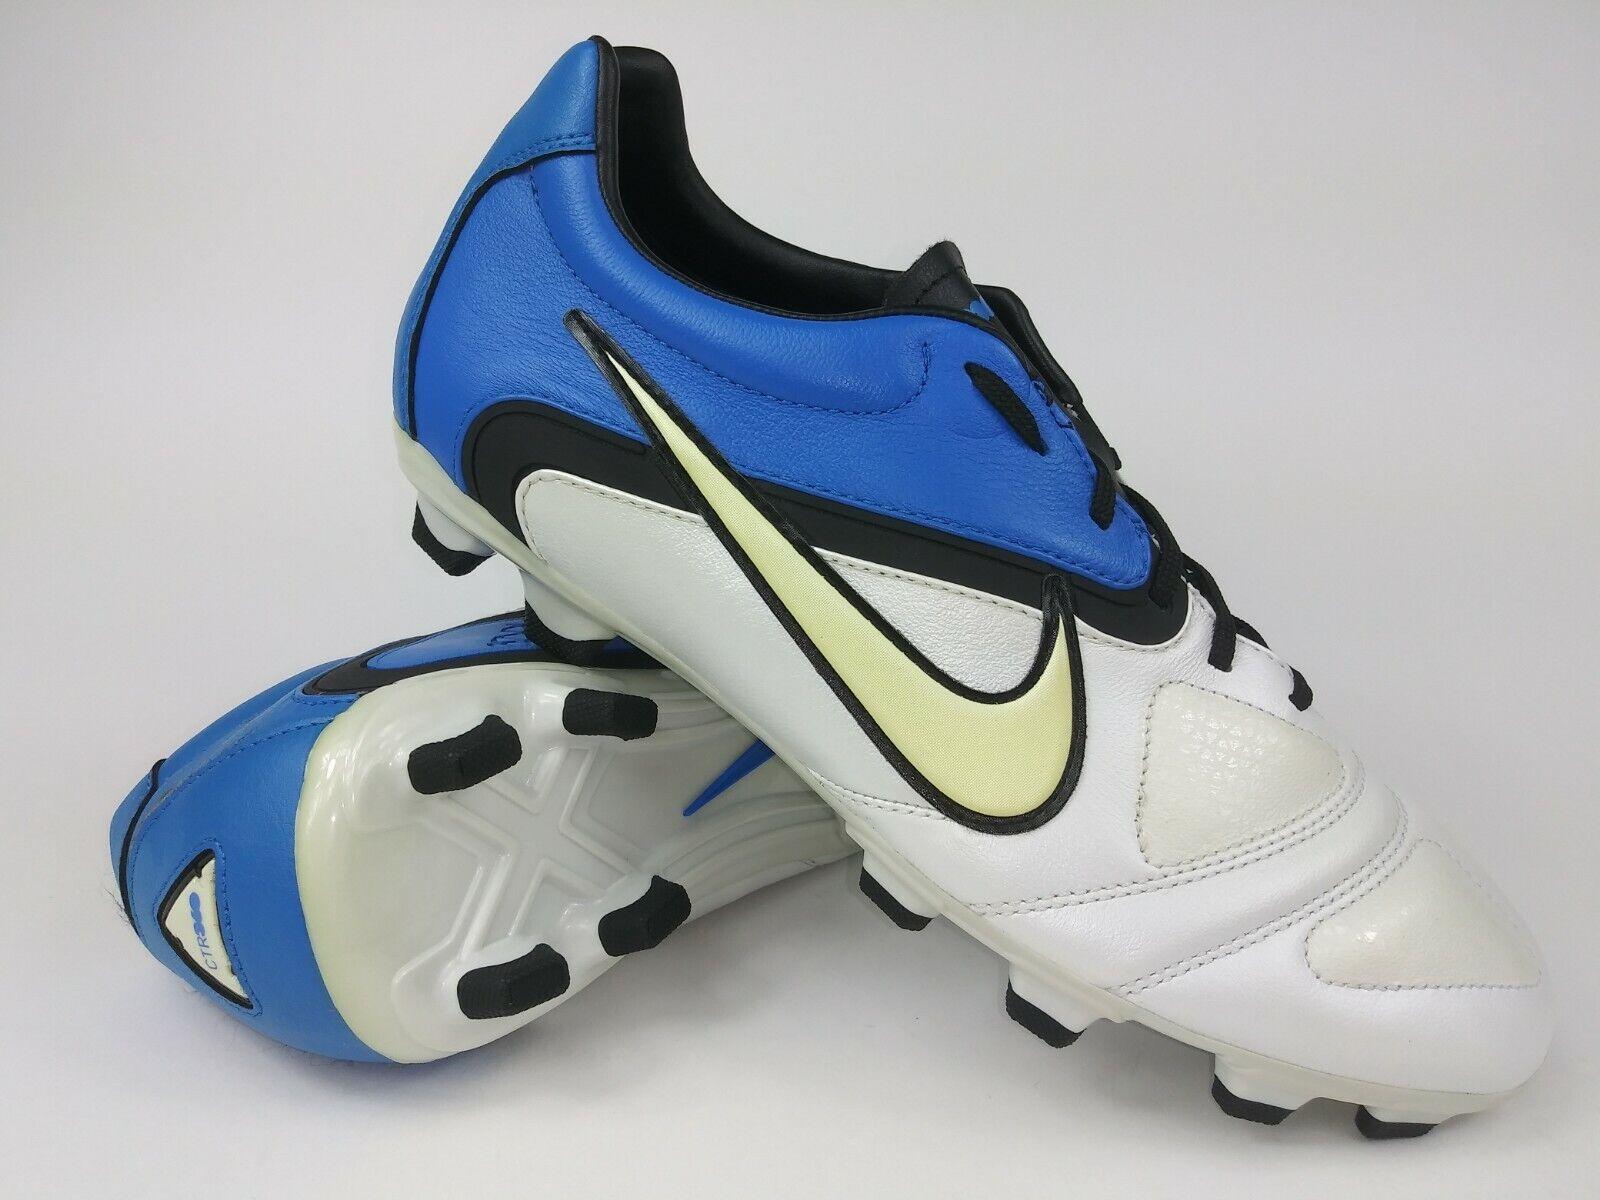 Nike Mens Rare CTR360 Libretto llFG 428731-104 Blau Weiß Soccer Cleats Stiefel